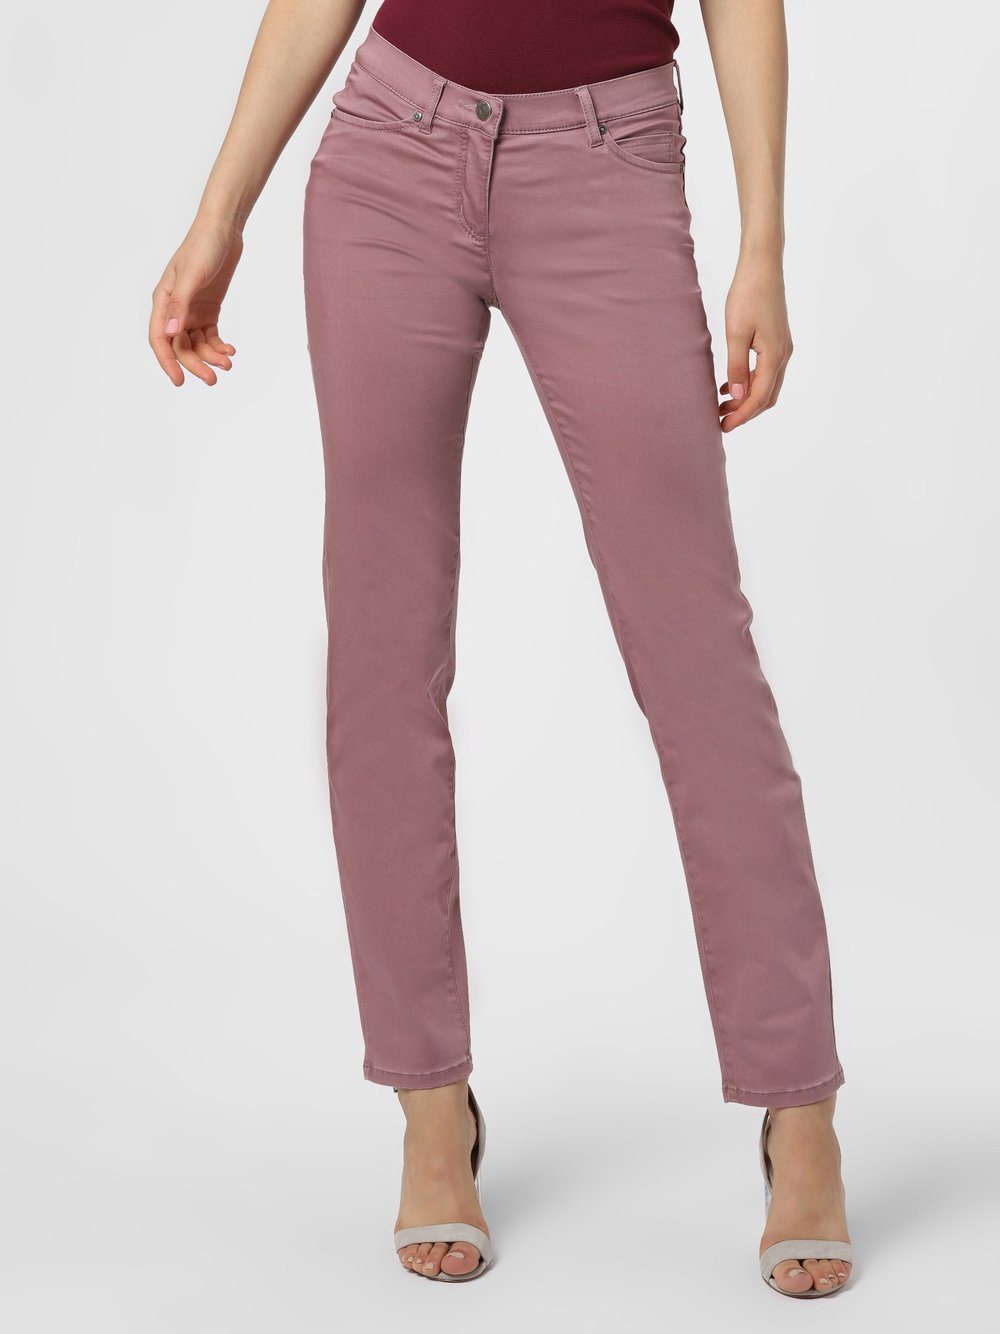 TONI – Spodnie damskie – Perfect Shape Slim, różowy Van Graaf 406306-0002-00460